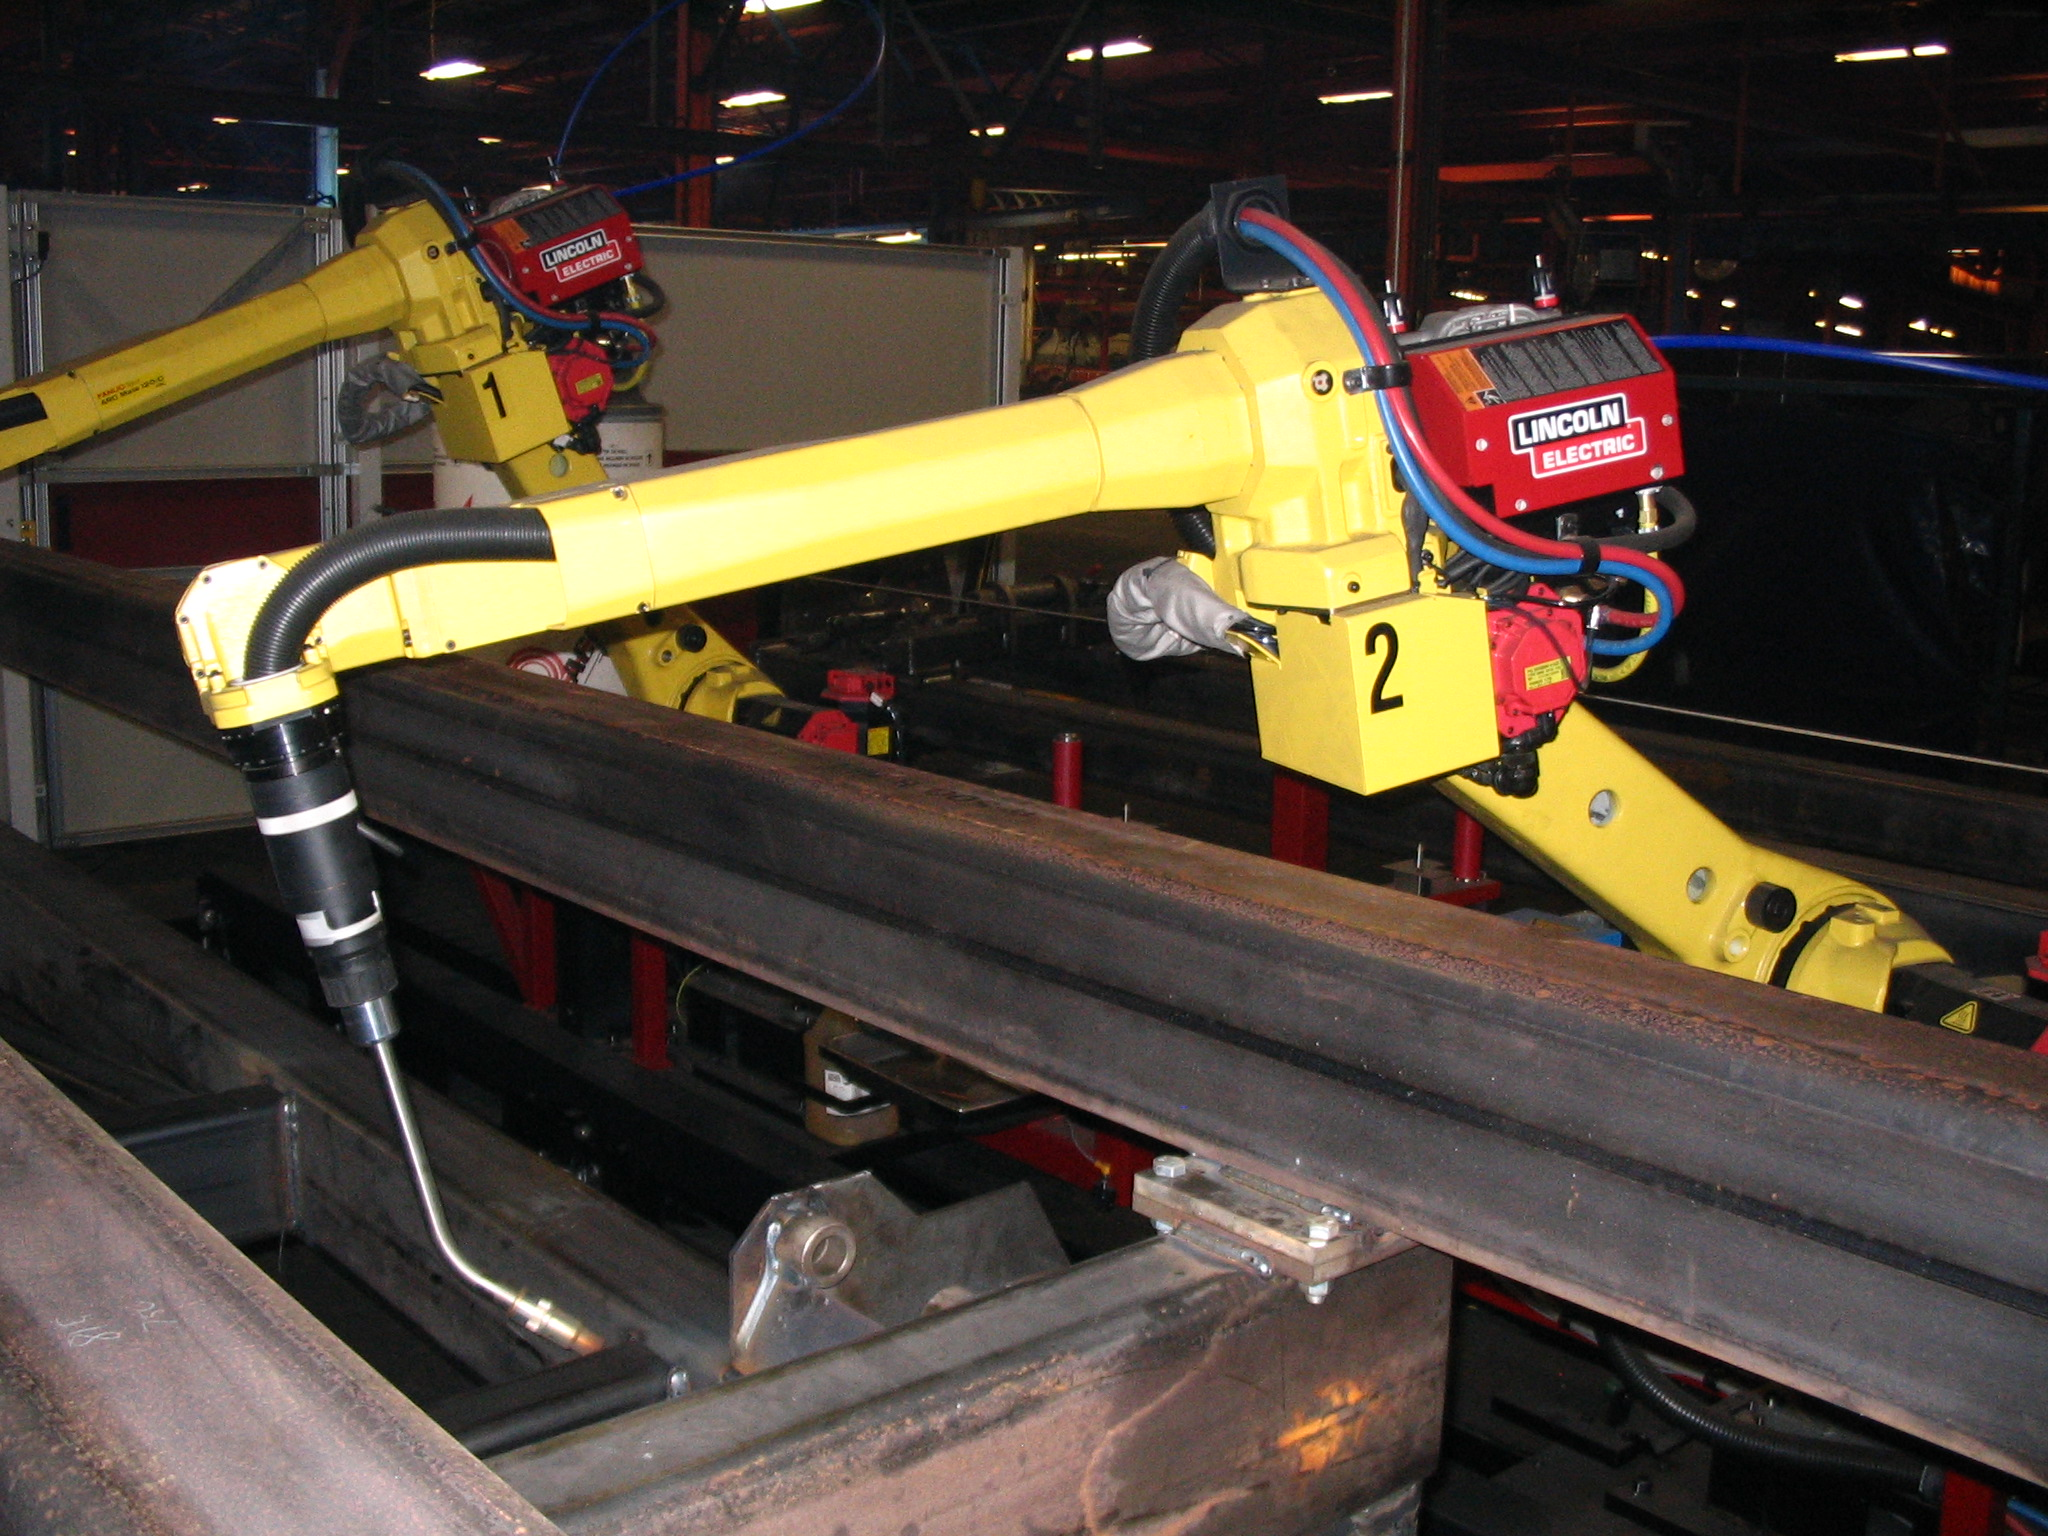 File:FANUC welding robot reaching jpg - Wikimedia Commons